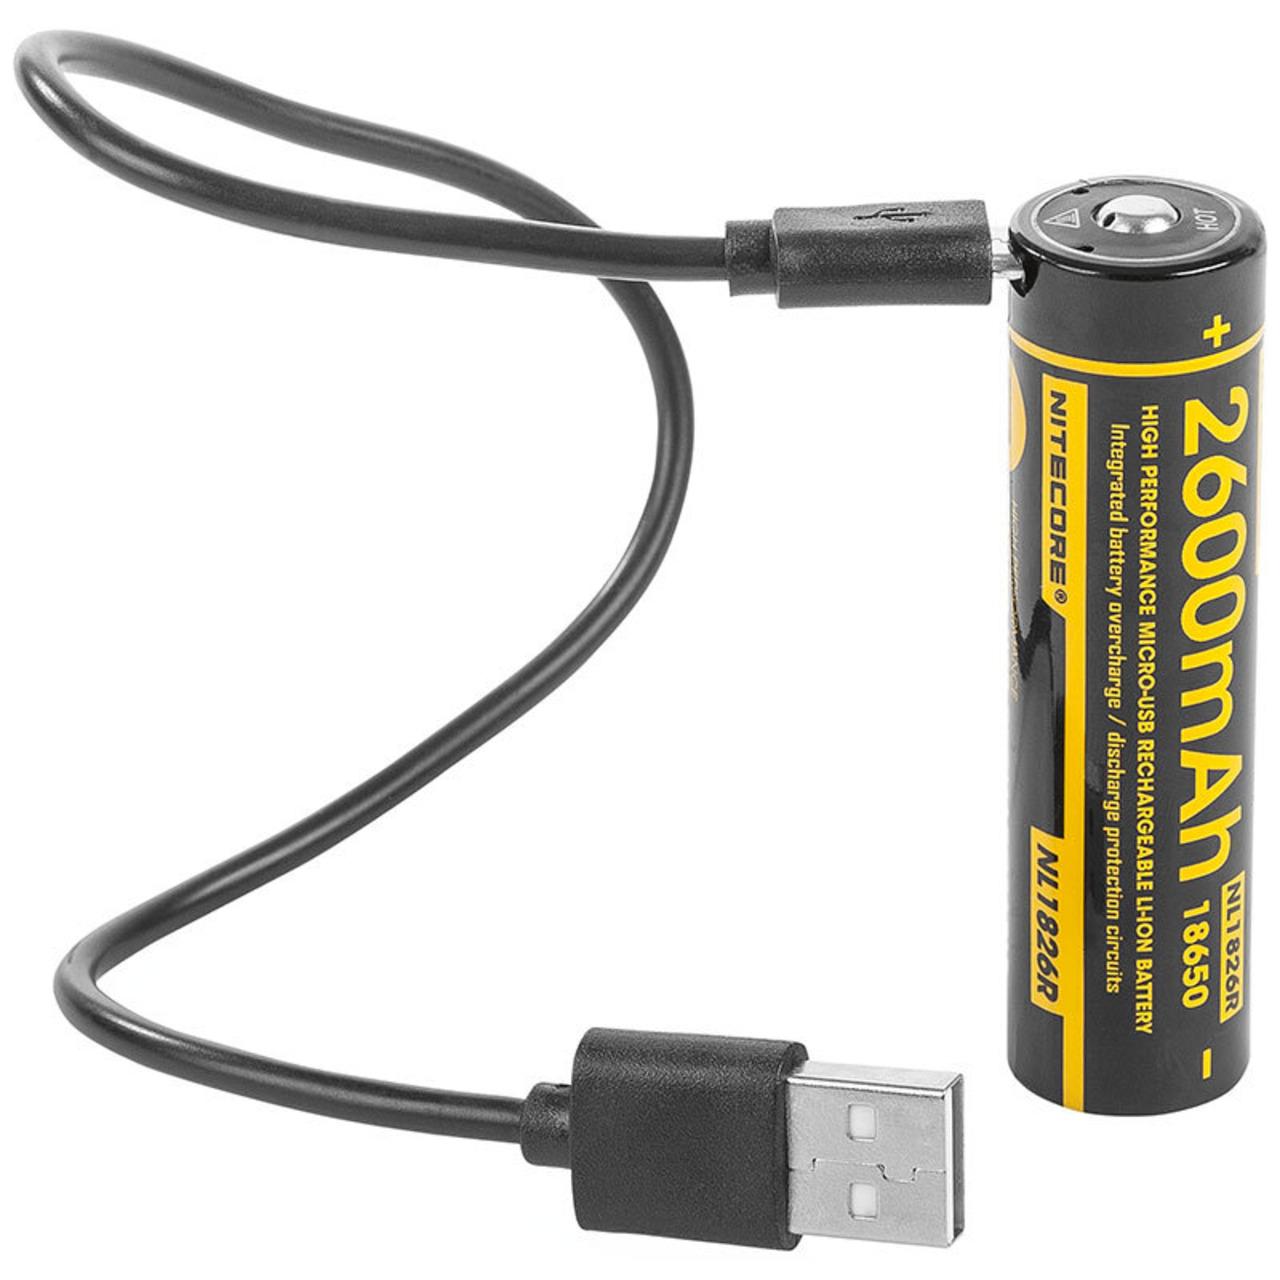 NiteCore Lithium Ion Akku 18650- 2600 mAh mit Micro-USB Ladeanschluss